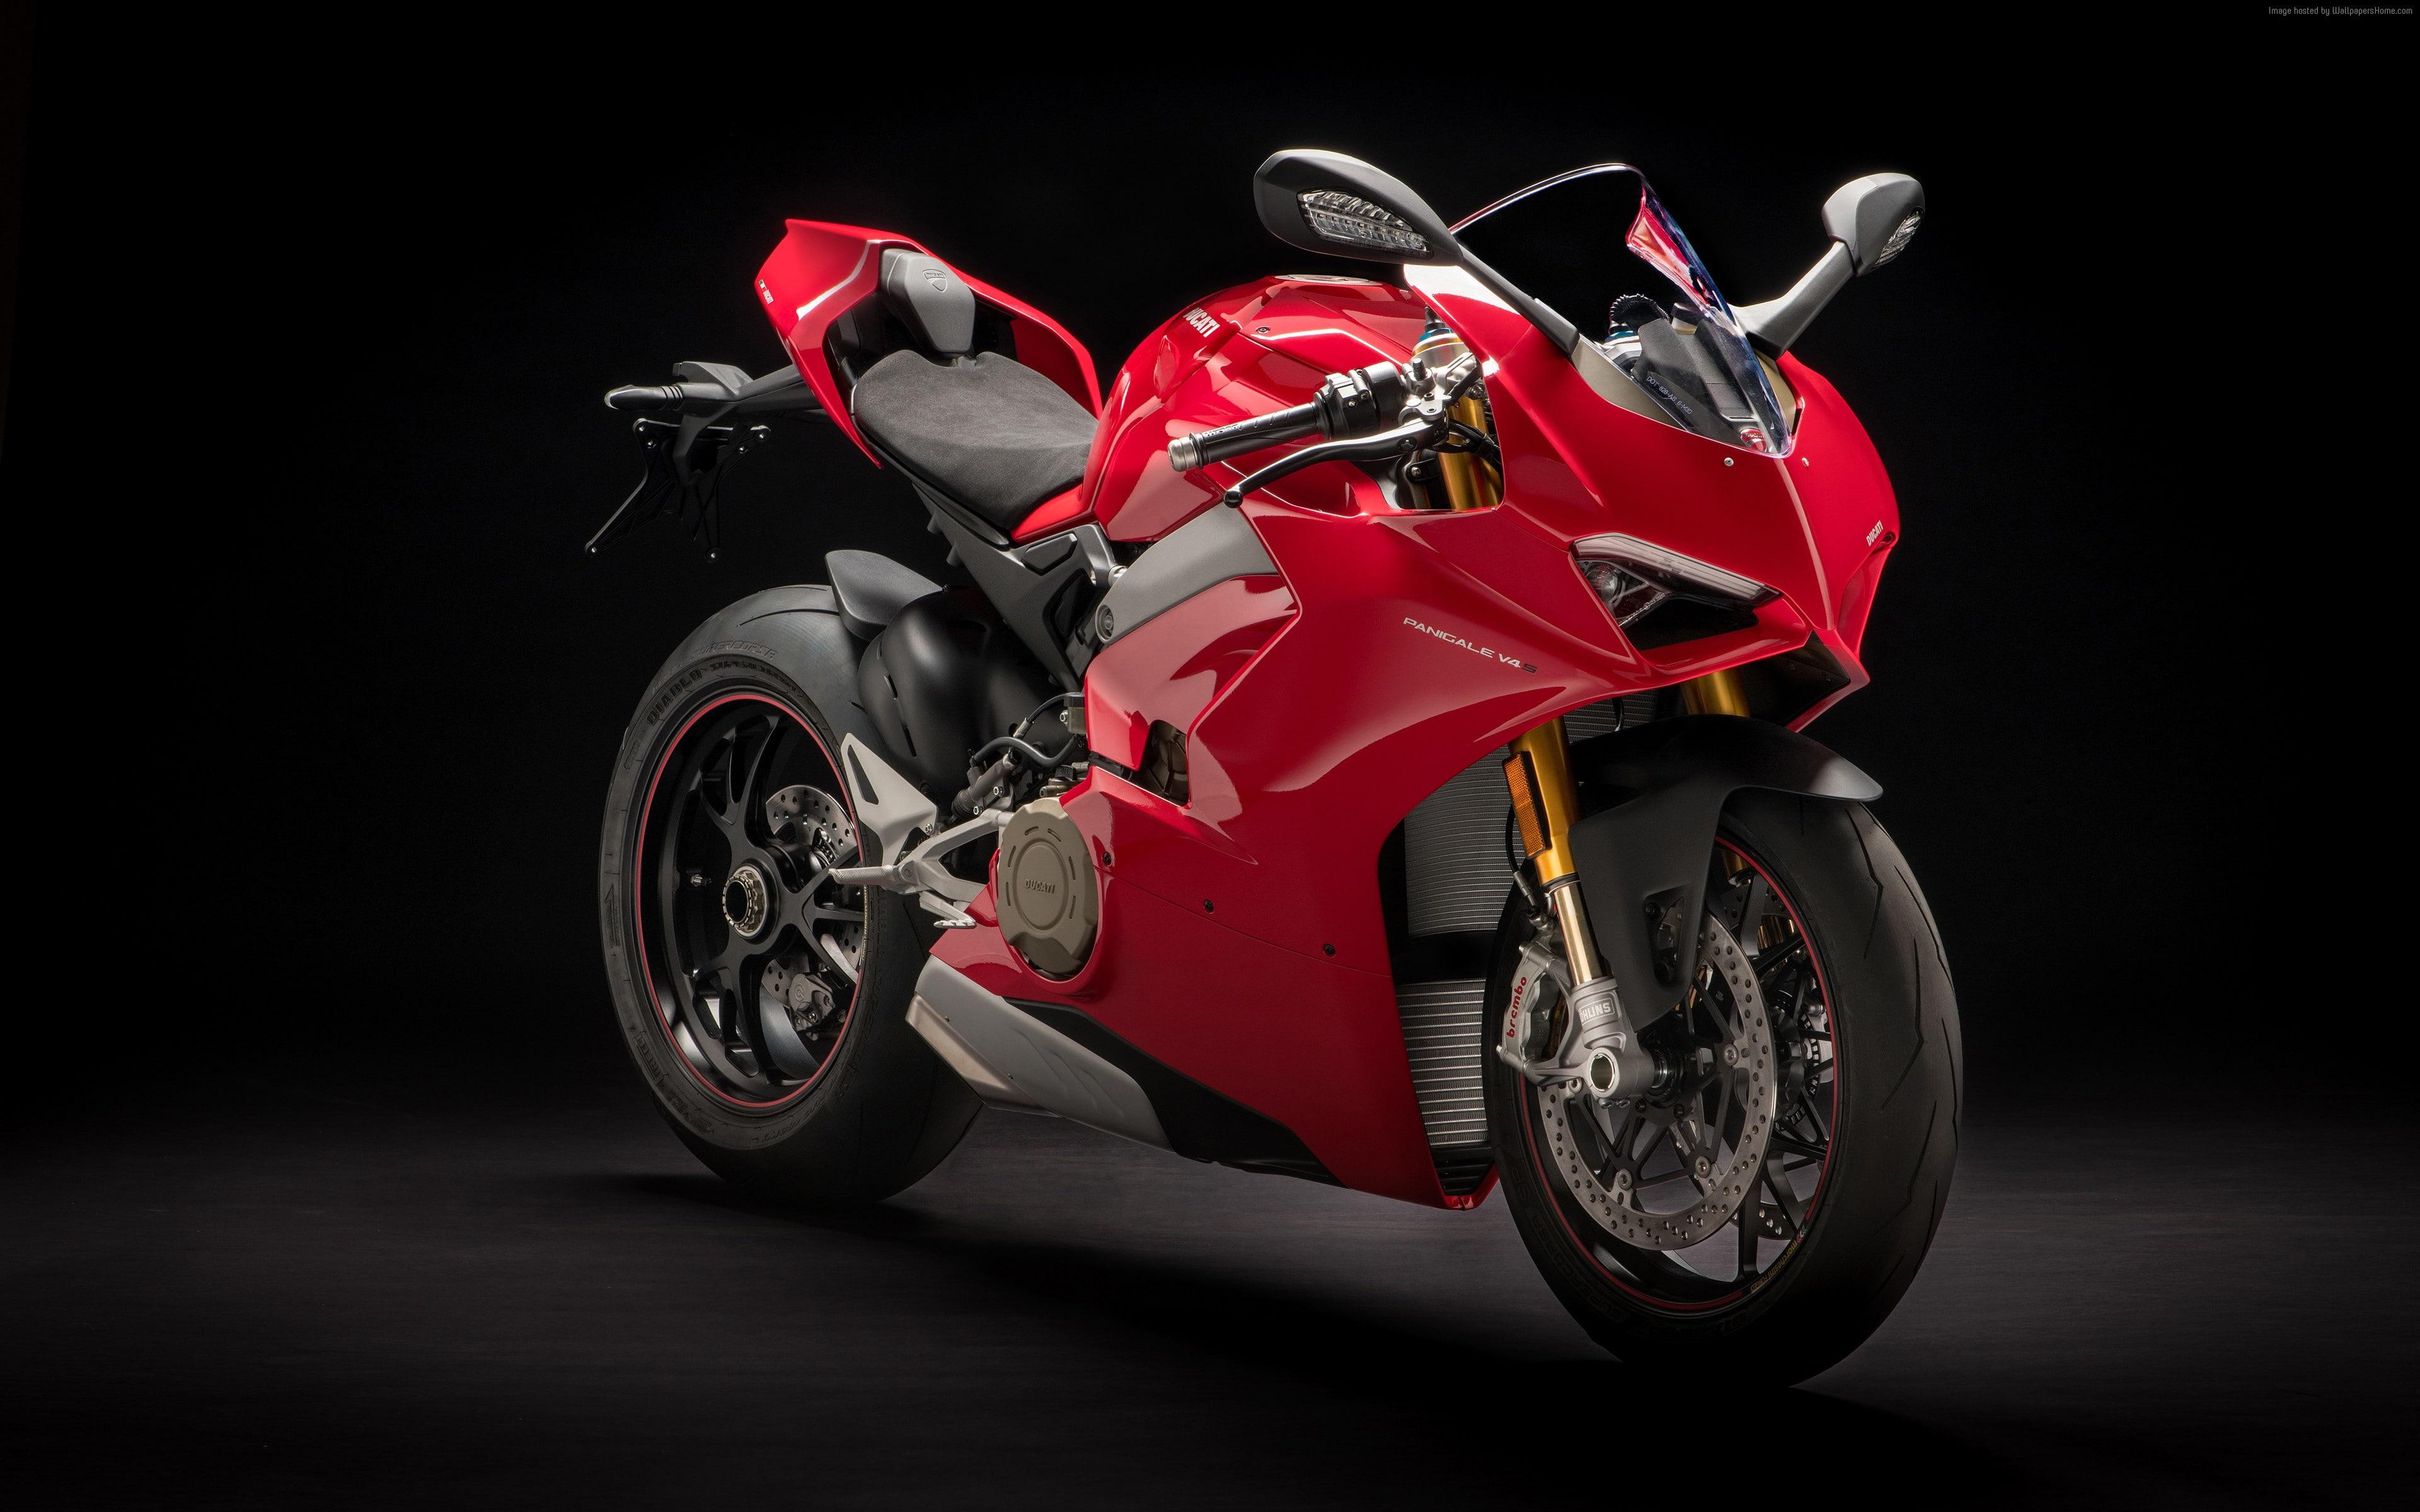 HD wallpaper 2018 Ducati Panigale V4 S 4K mode of transportation 3840x2400